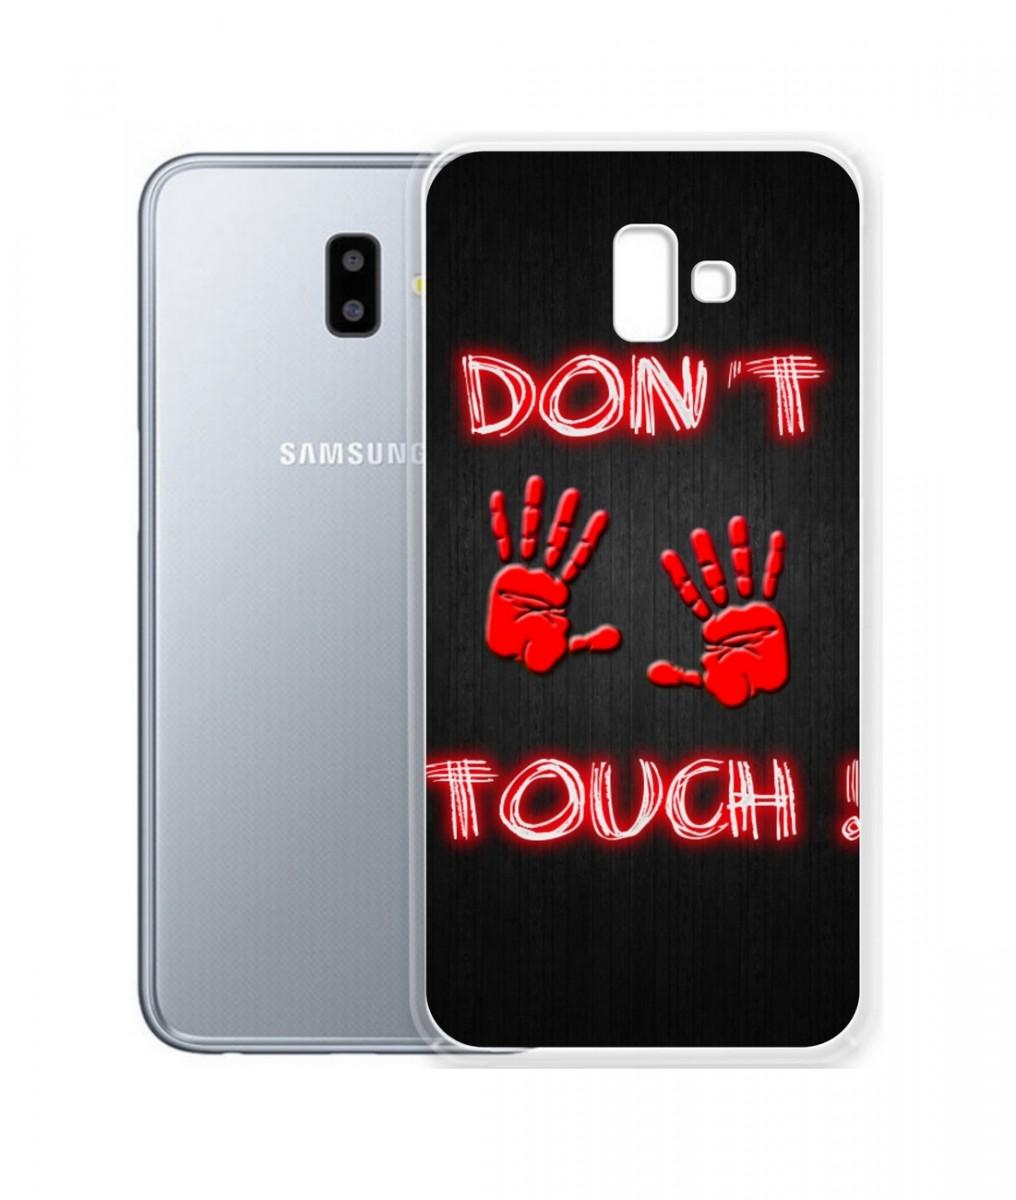 Pouzdro TopQ Samsung J6+ silikon Don't touch red 34044 (kryt neboli obal na mobil Samsung J6+)